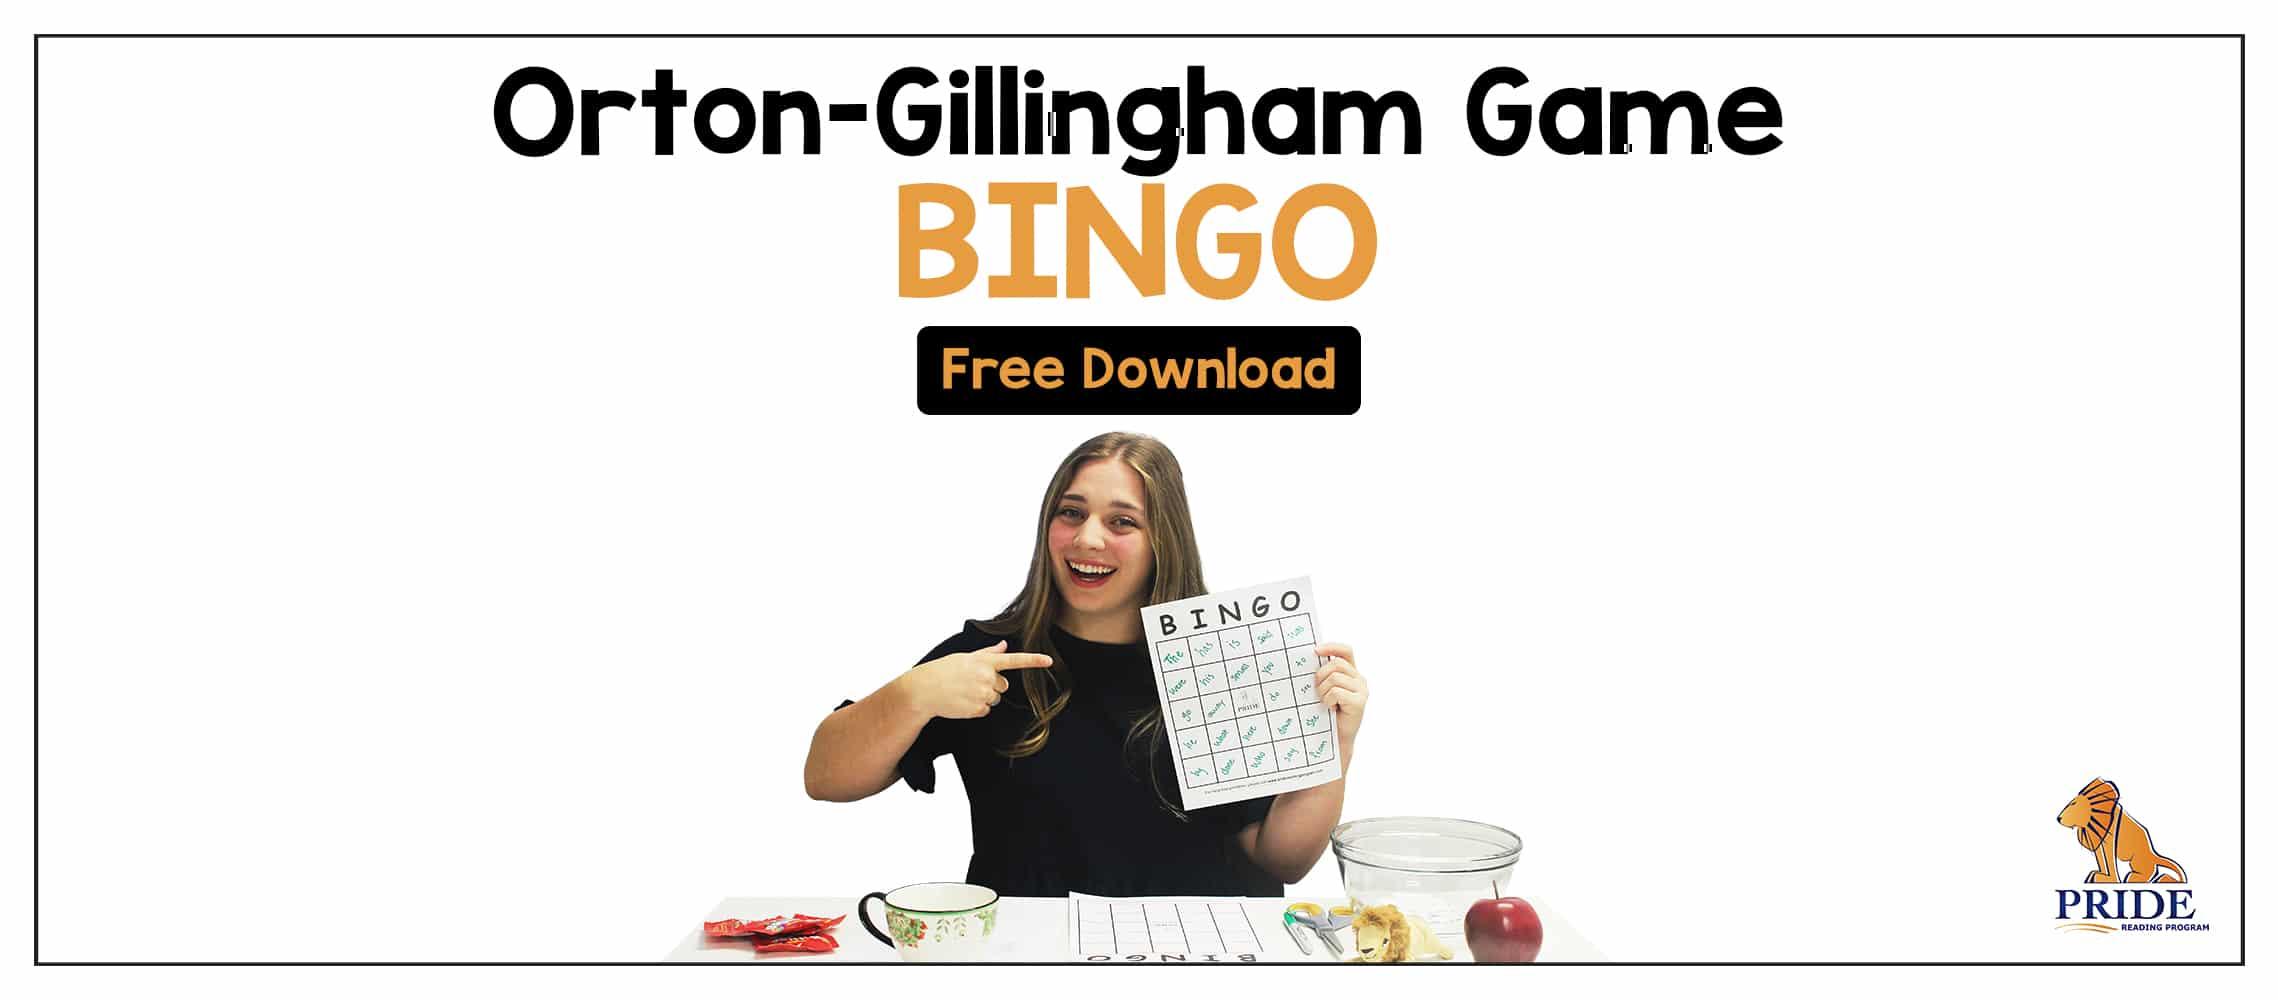 Orton Gillingham Game